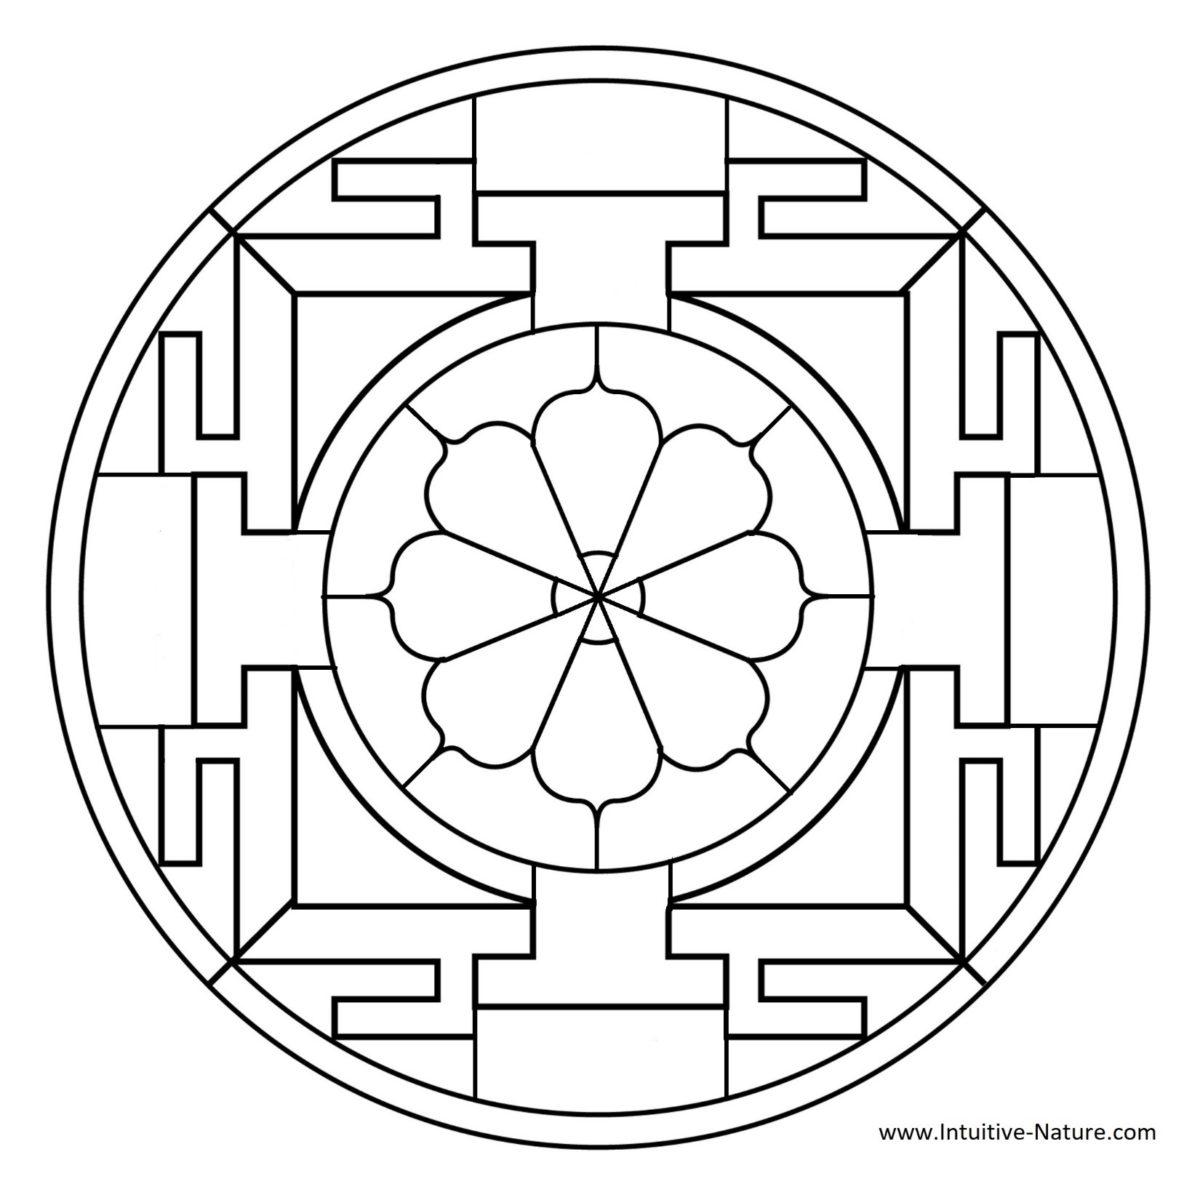 Download your free Mandala Images